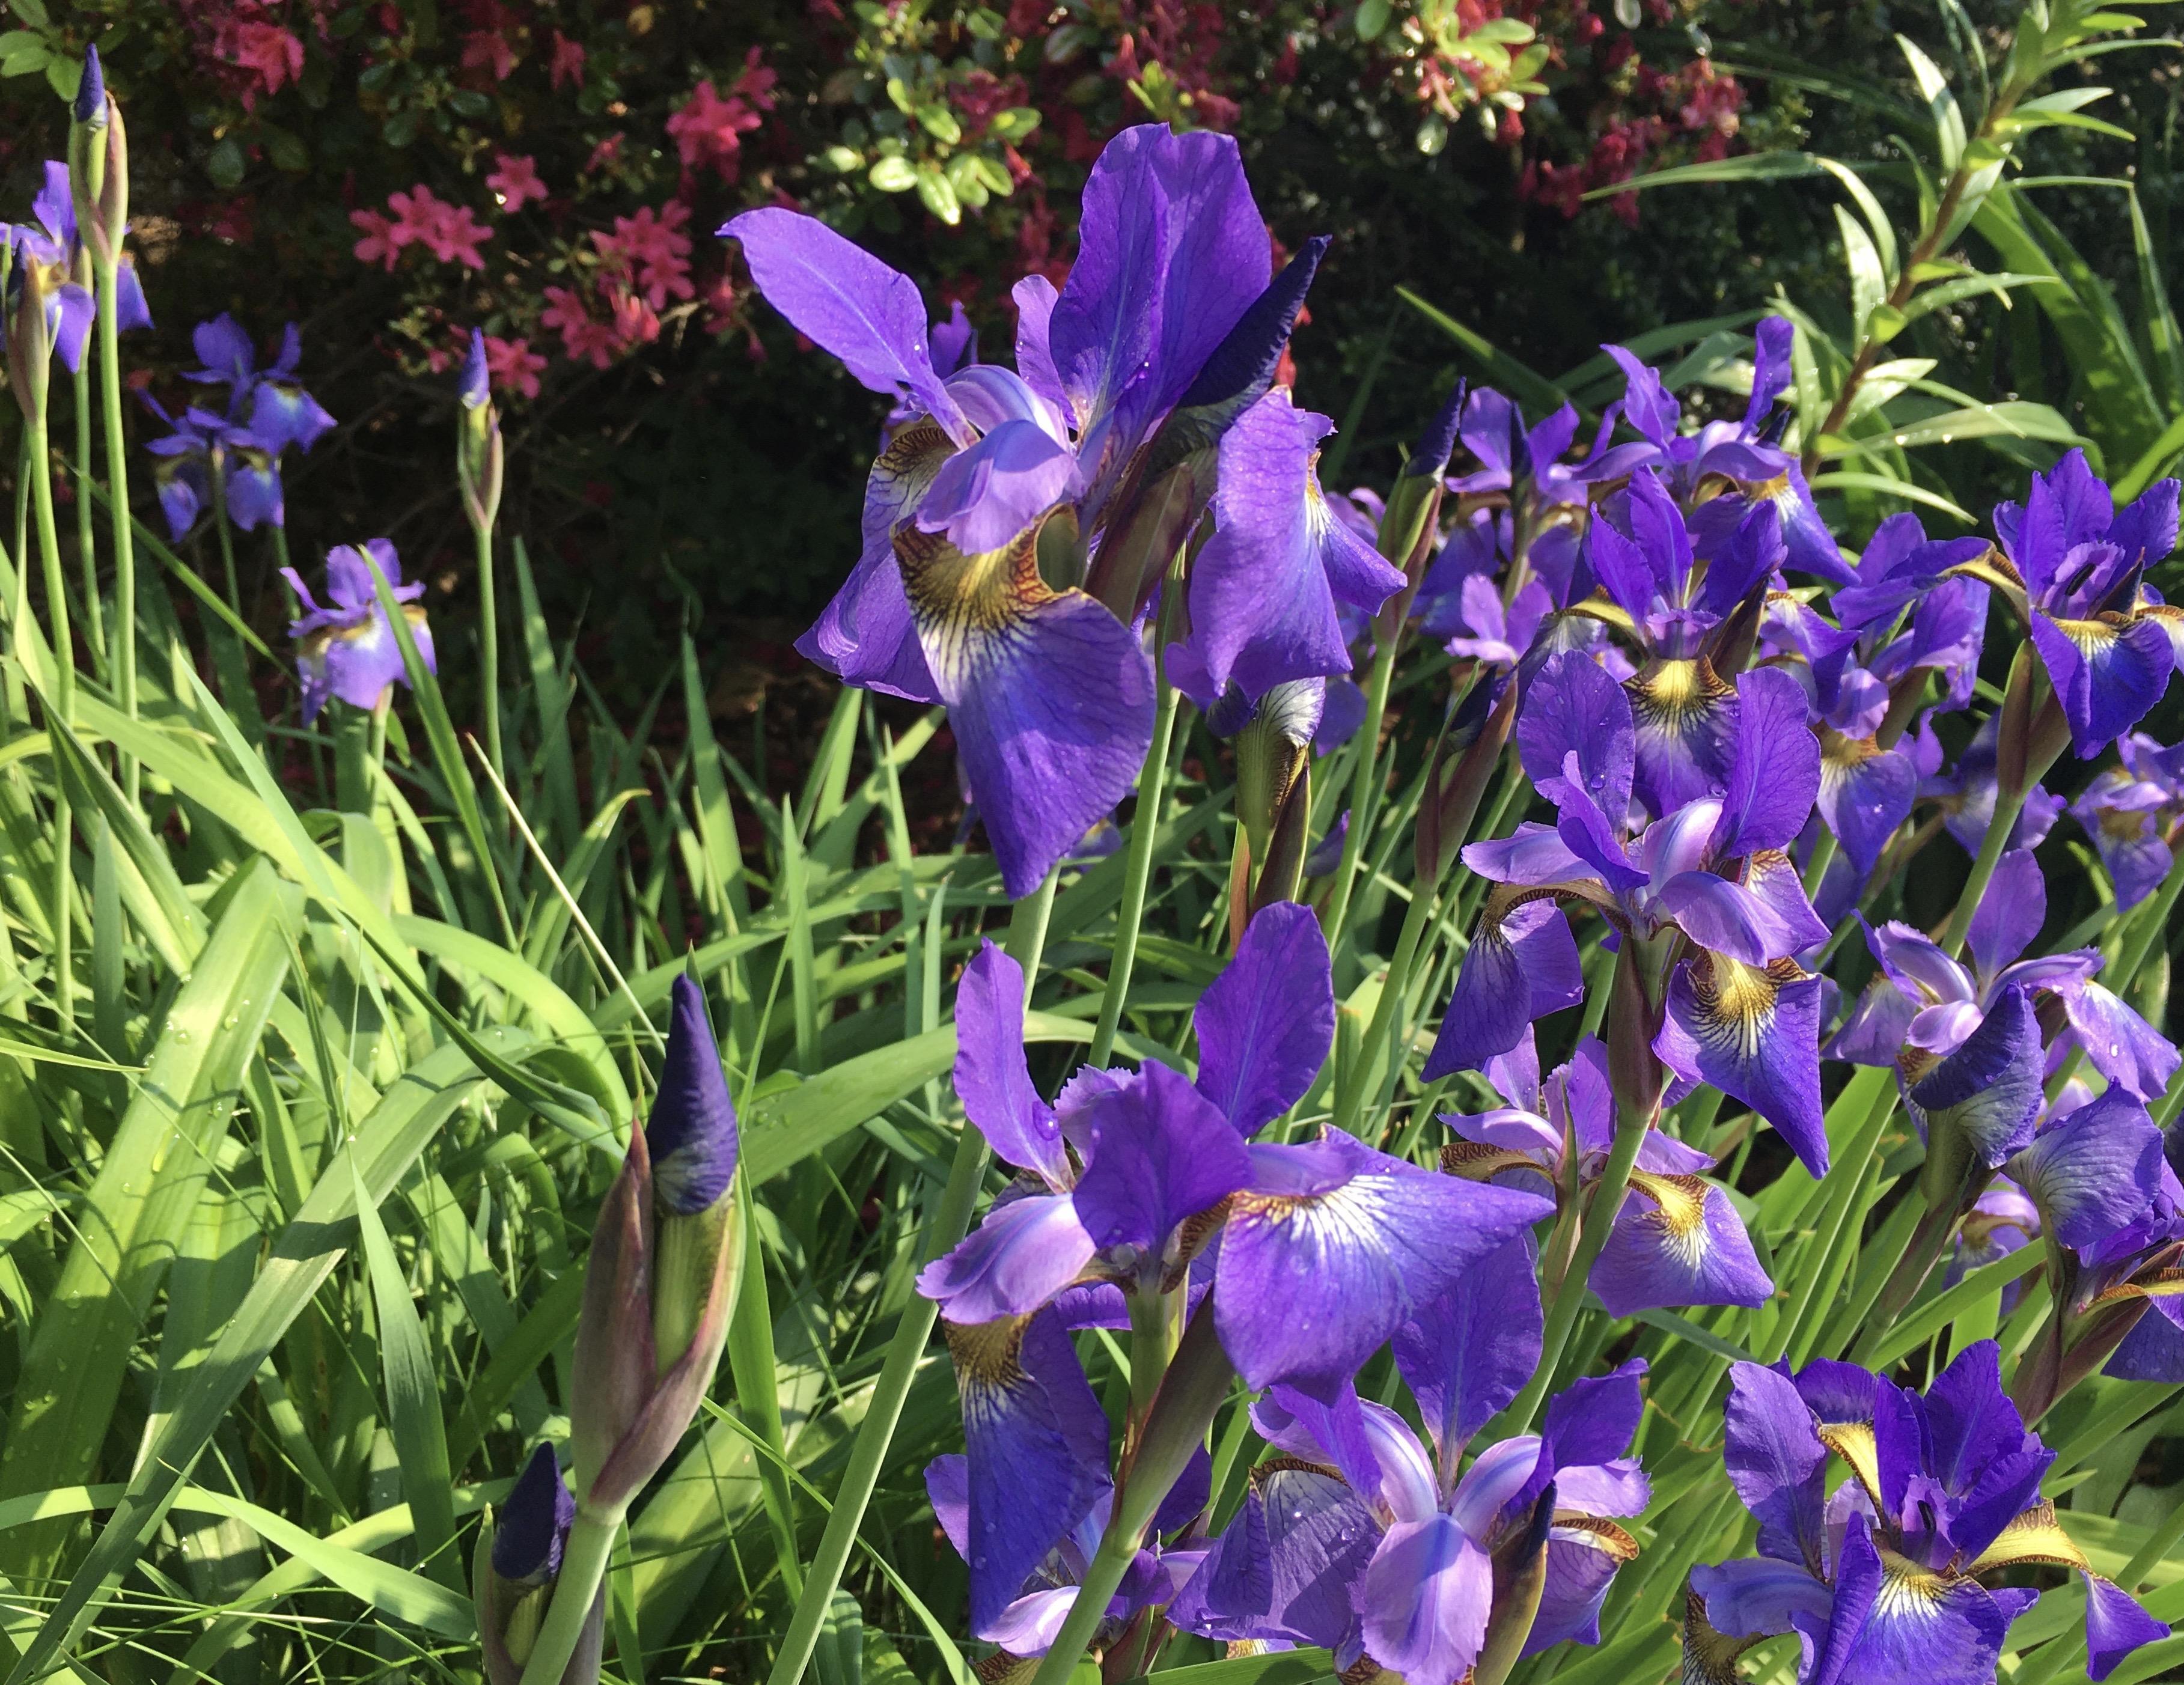 Blue Irises in front of red azalea